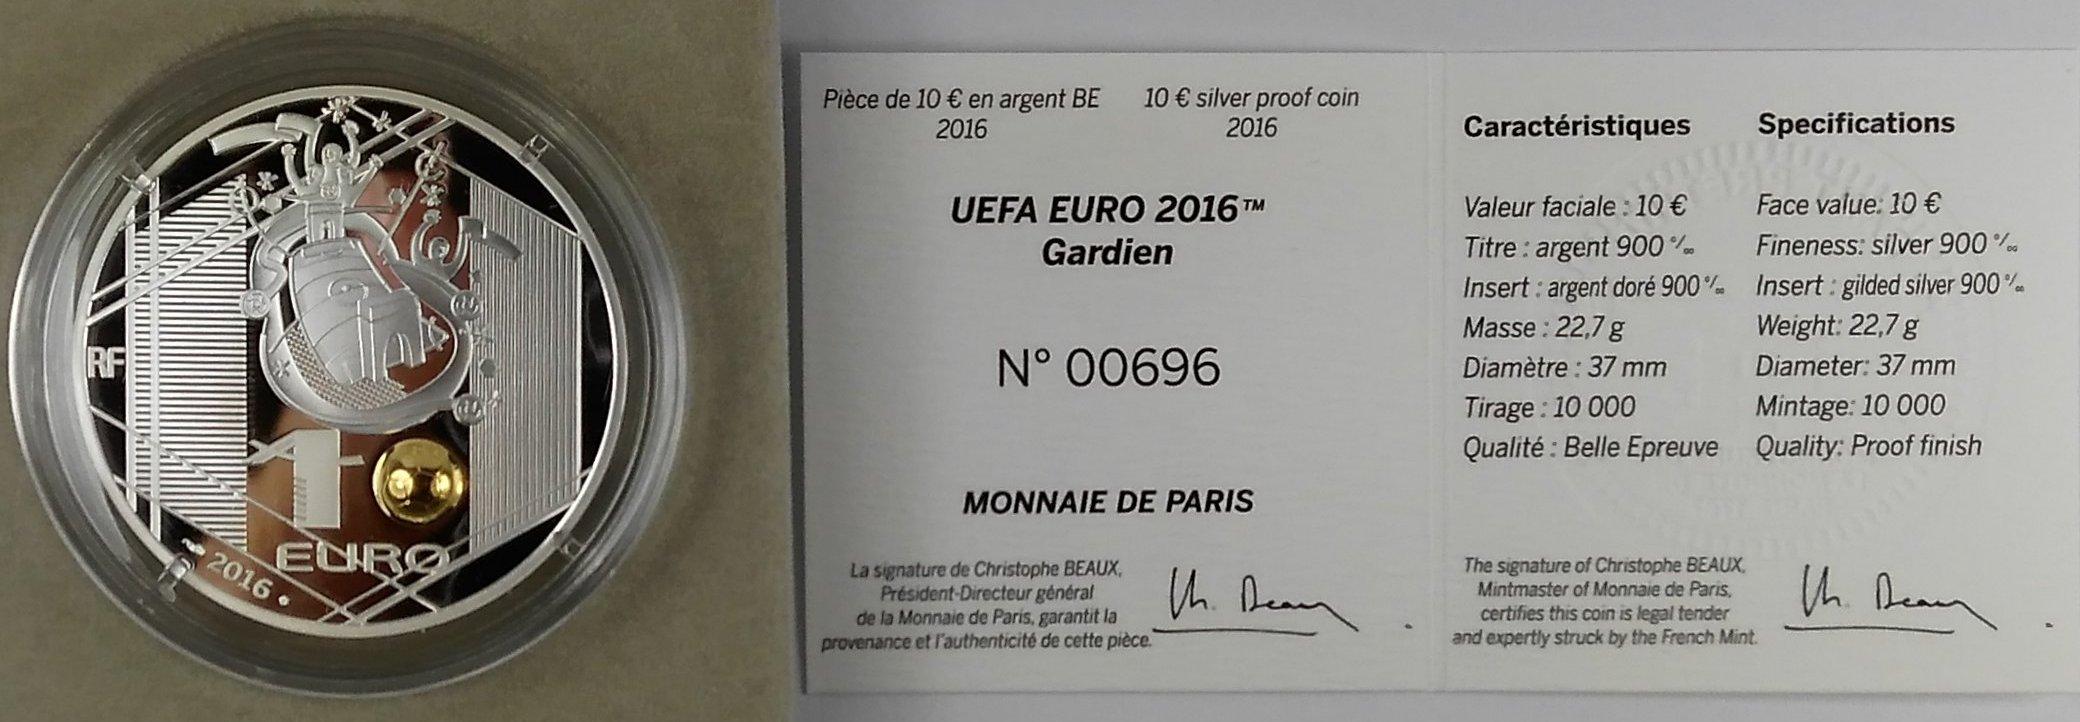 euro2016srebrnjak3a